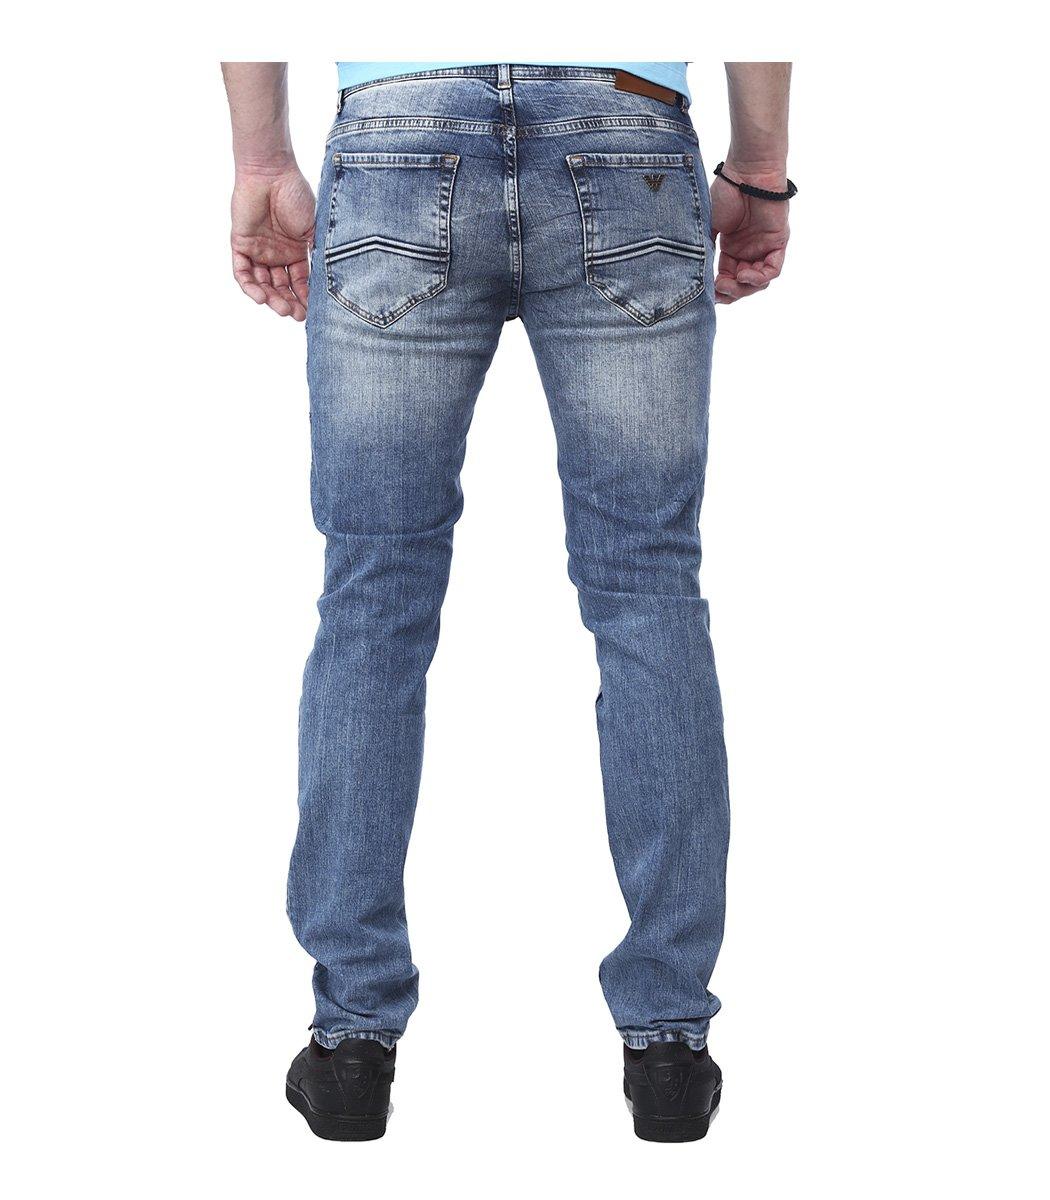 Голубые джинсы Emporio Armani гранж 3144